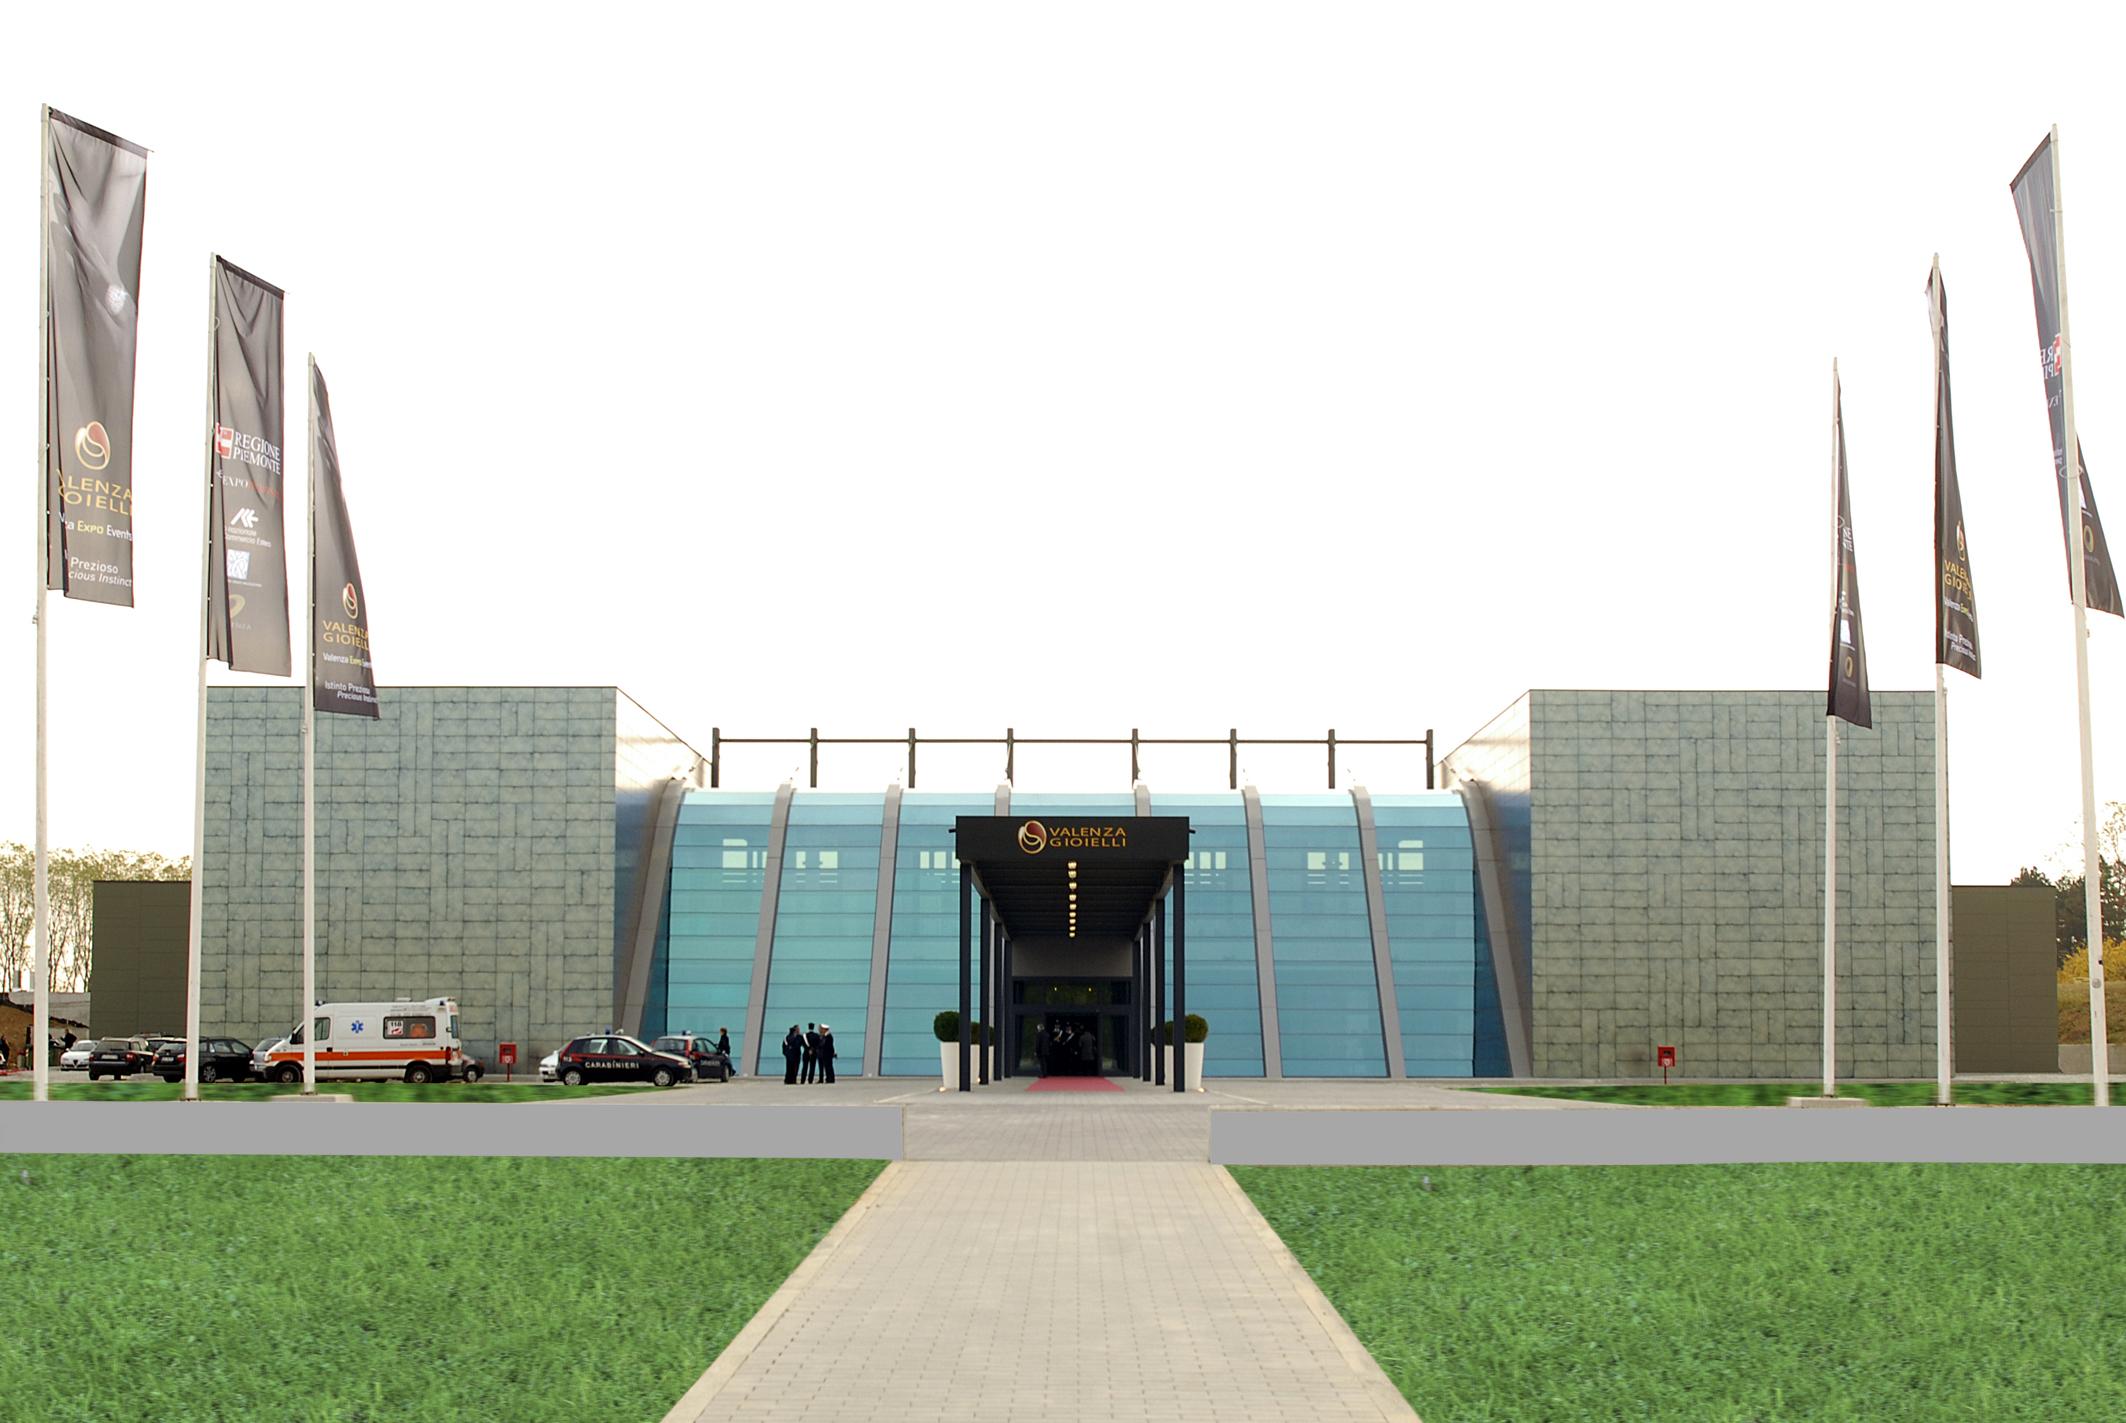 Centro Espositivo Expo Piemonte